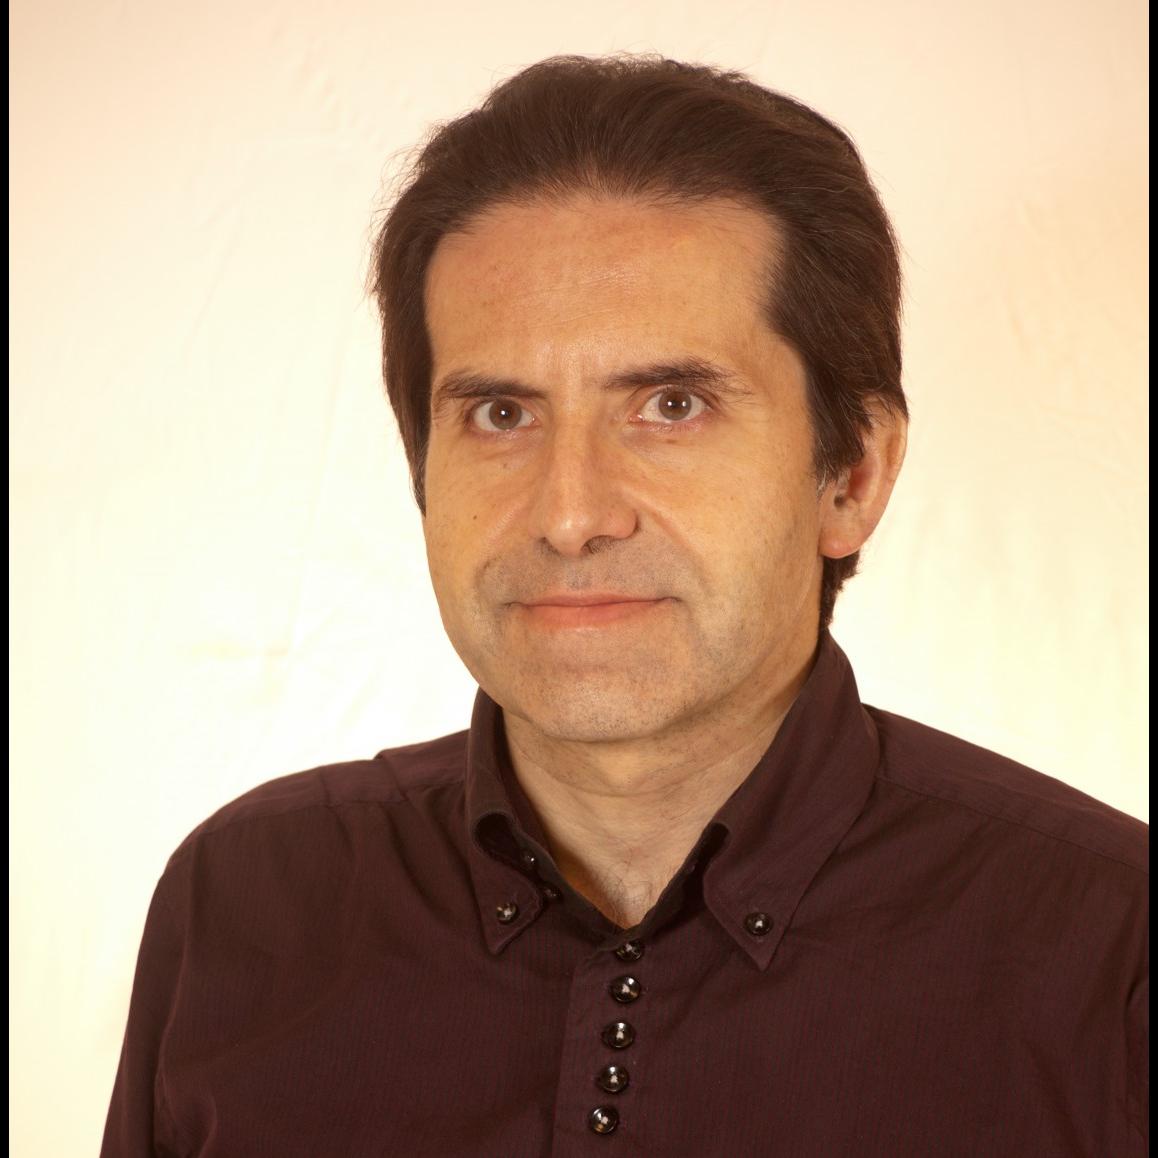 JOSEP A. TRIBÓ